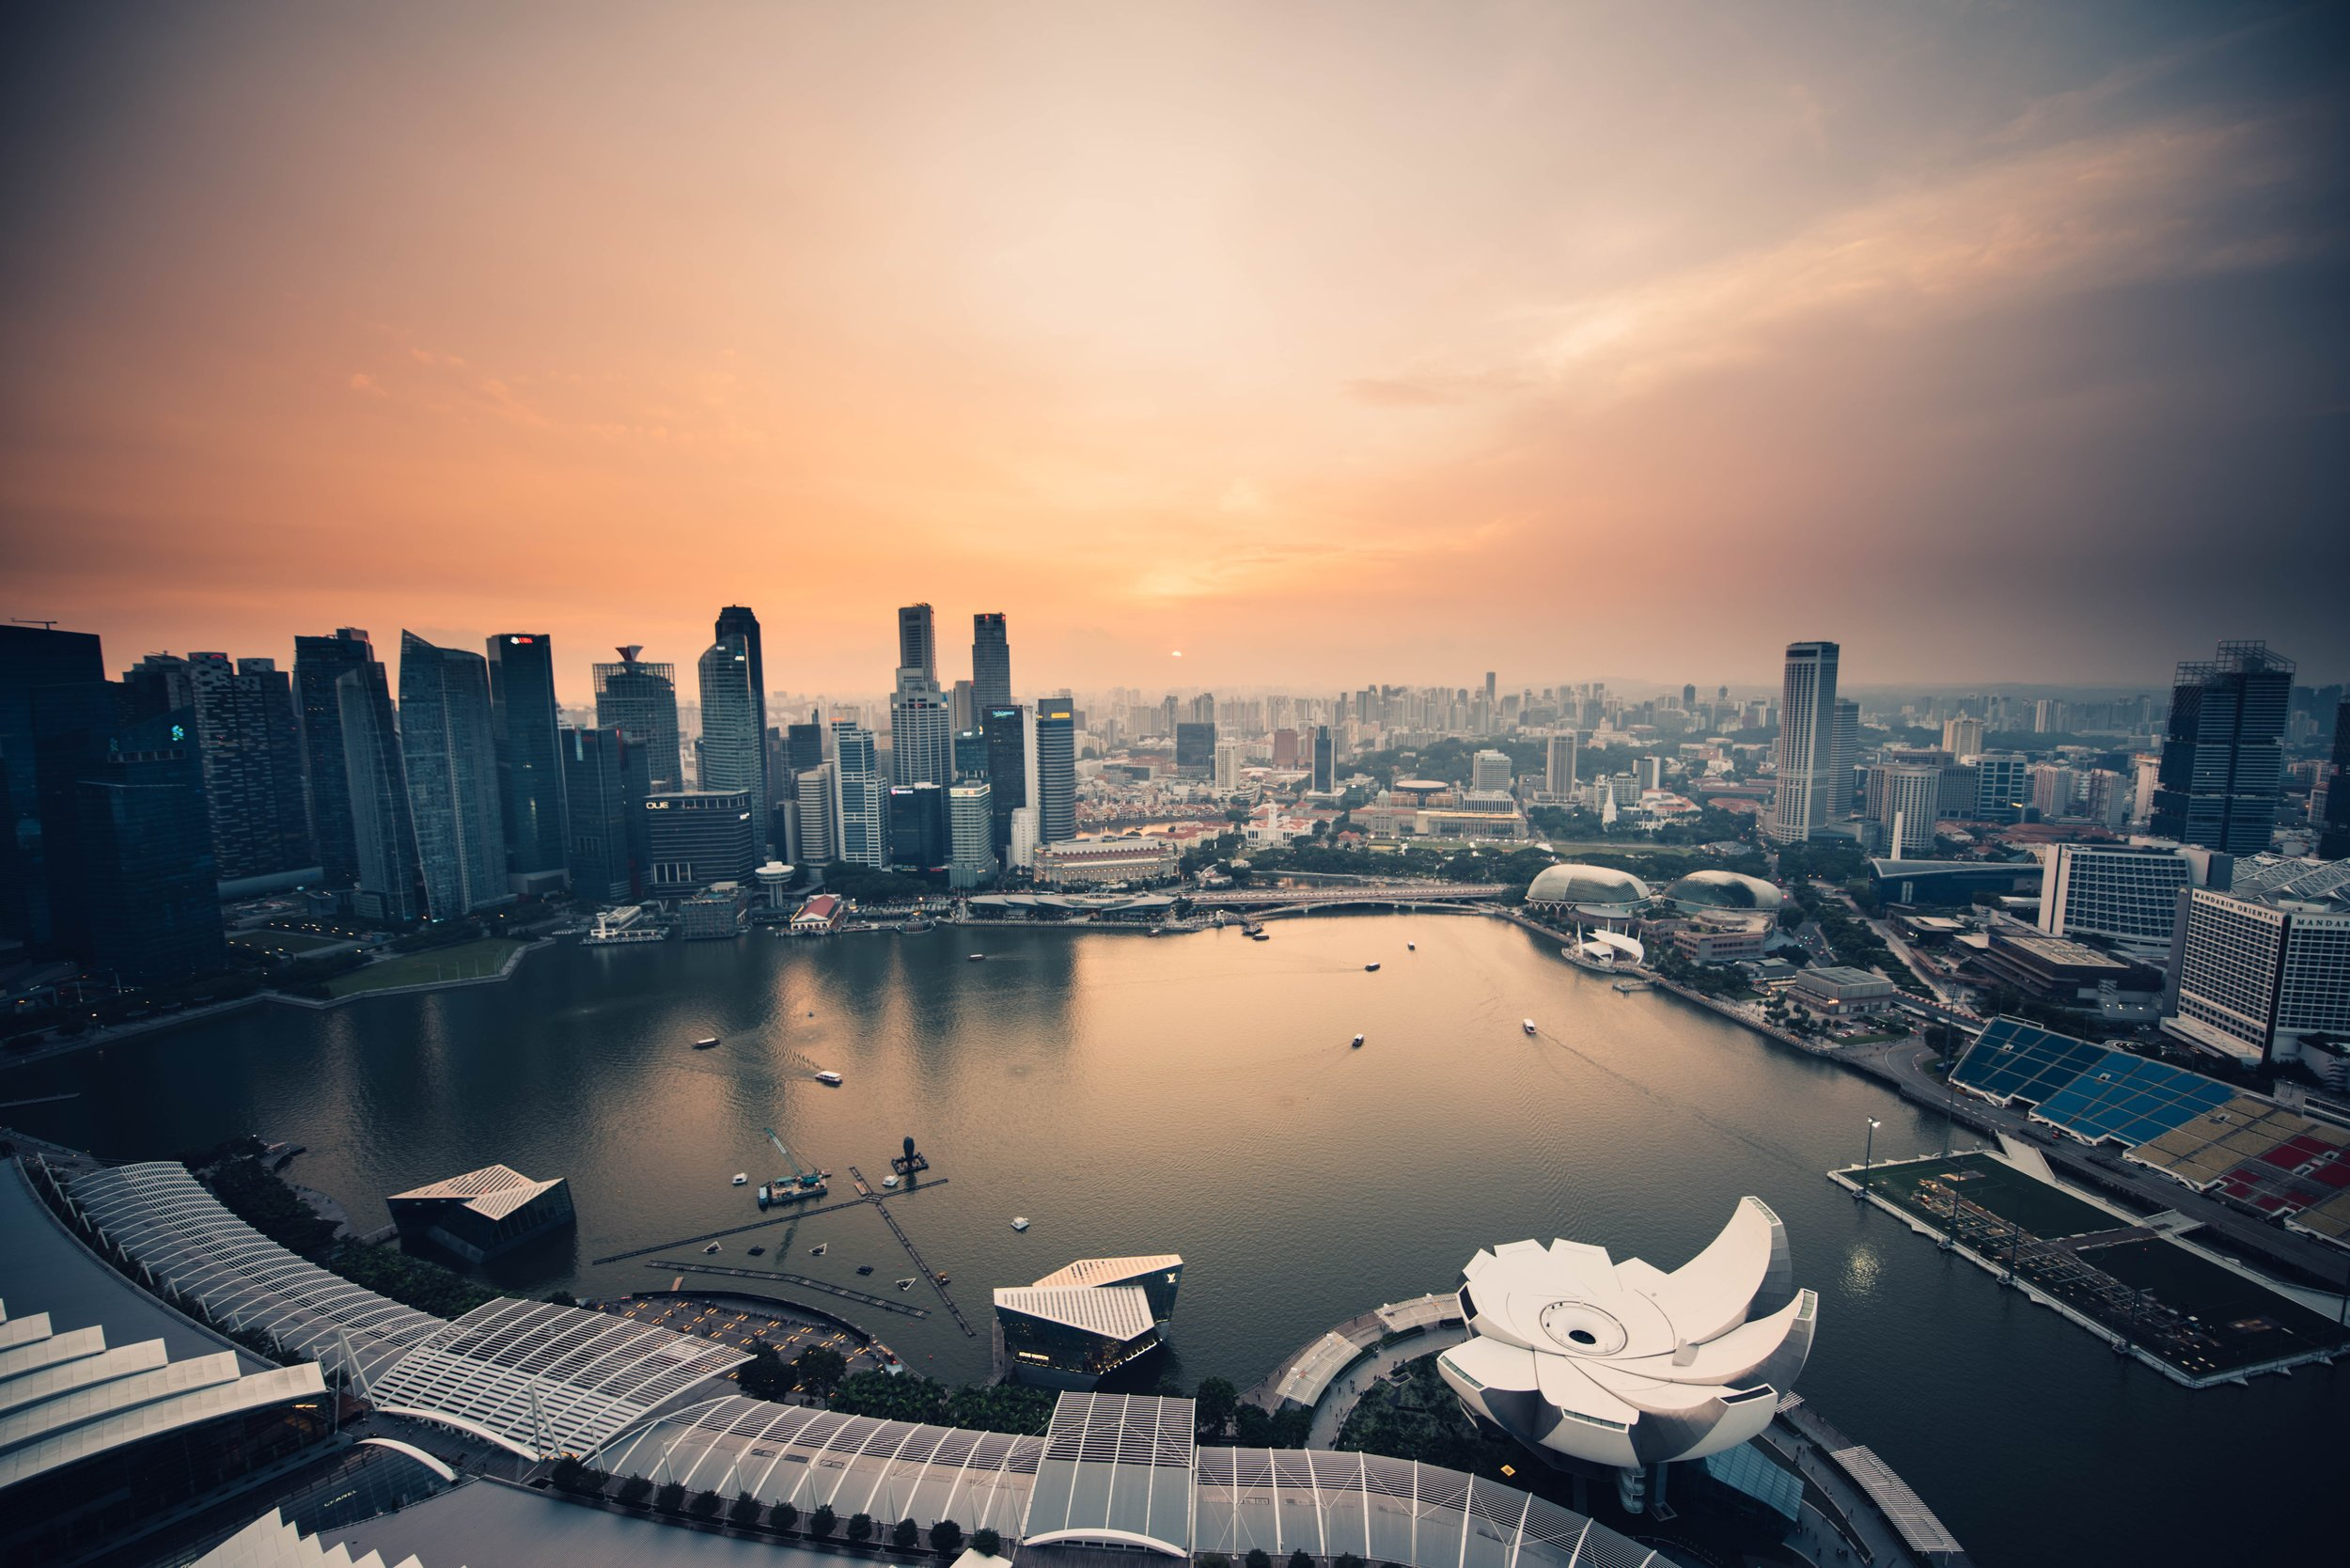 <b> Singapore </b>